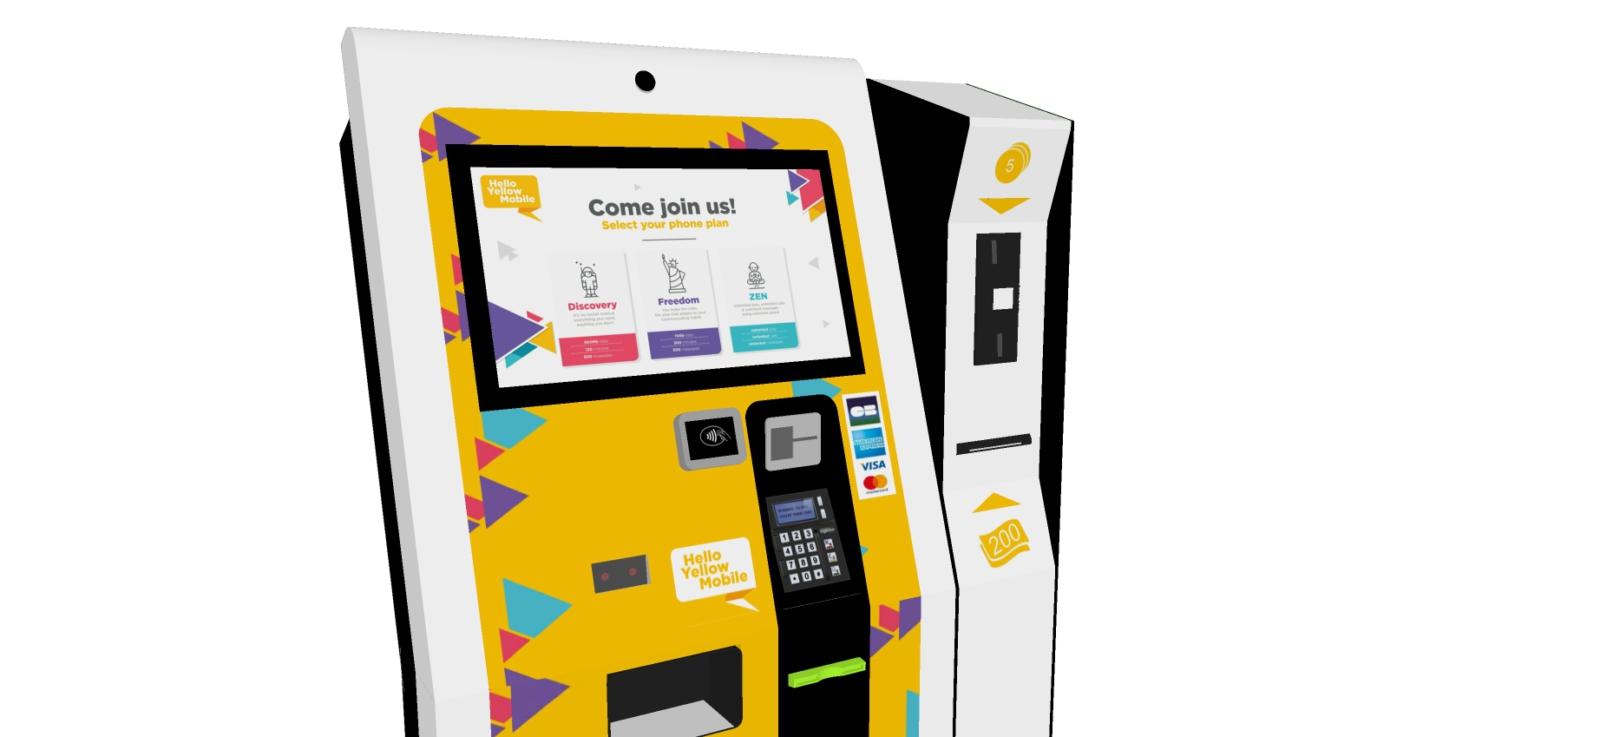 SIM card vending kiosk-payment cash-IPM france